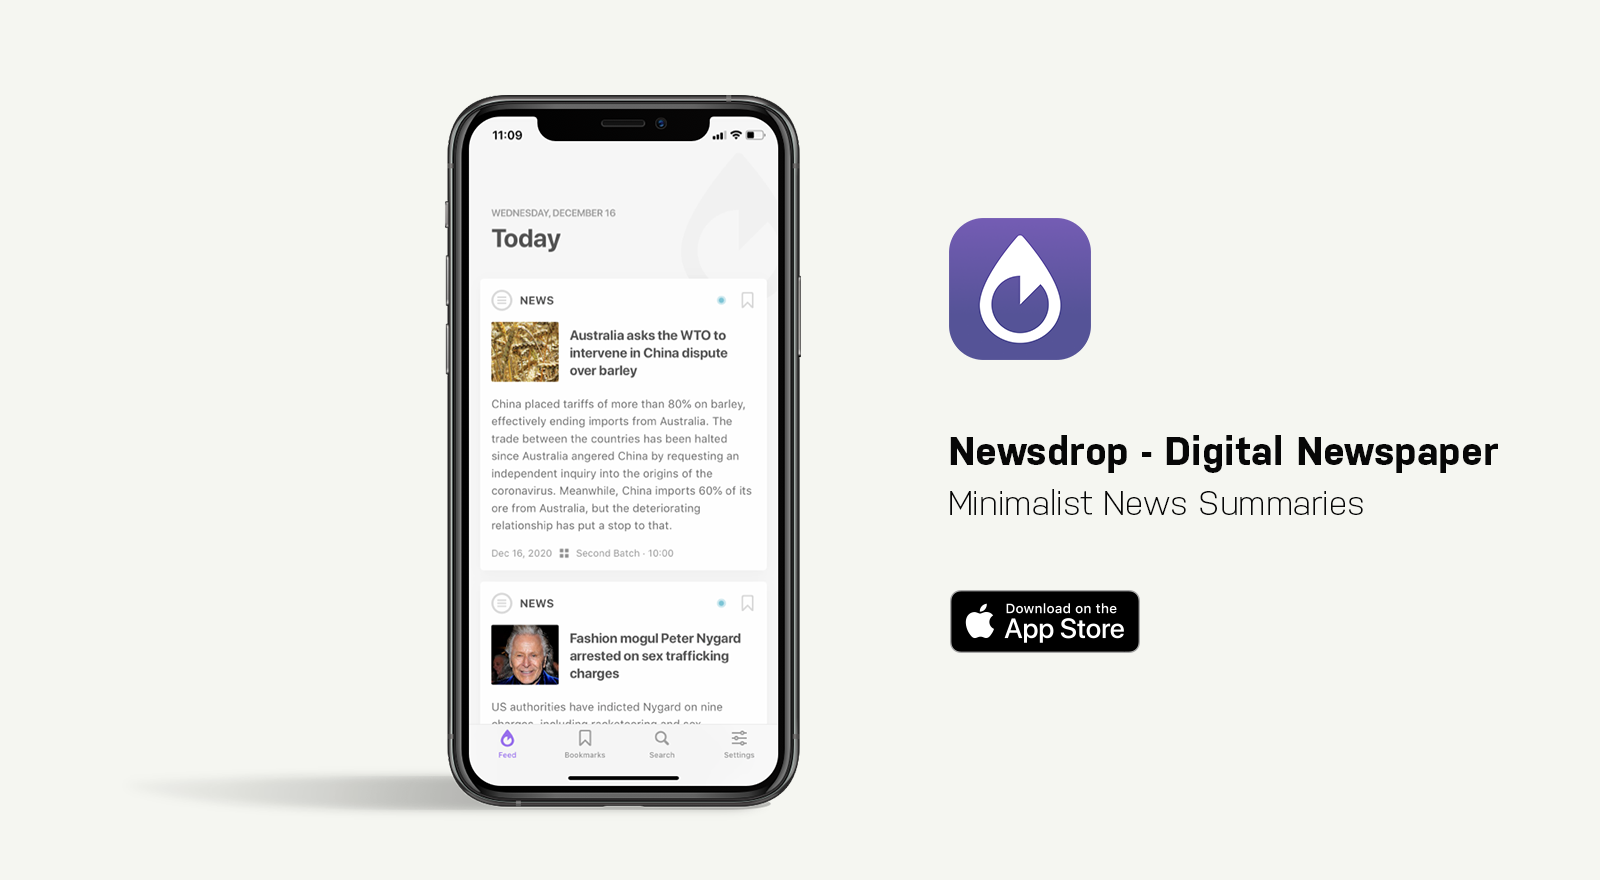 newsdrop app